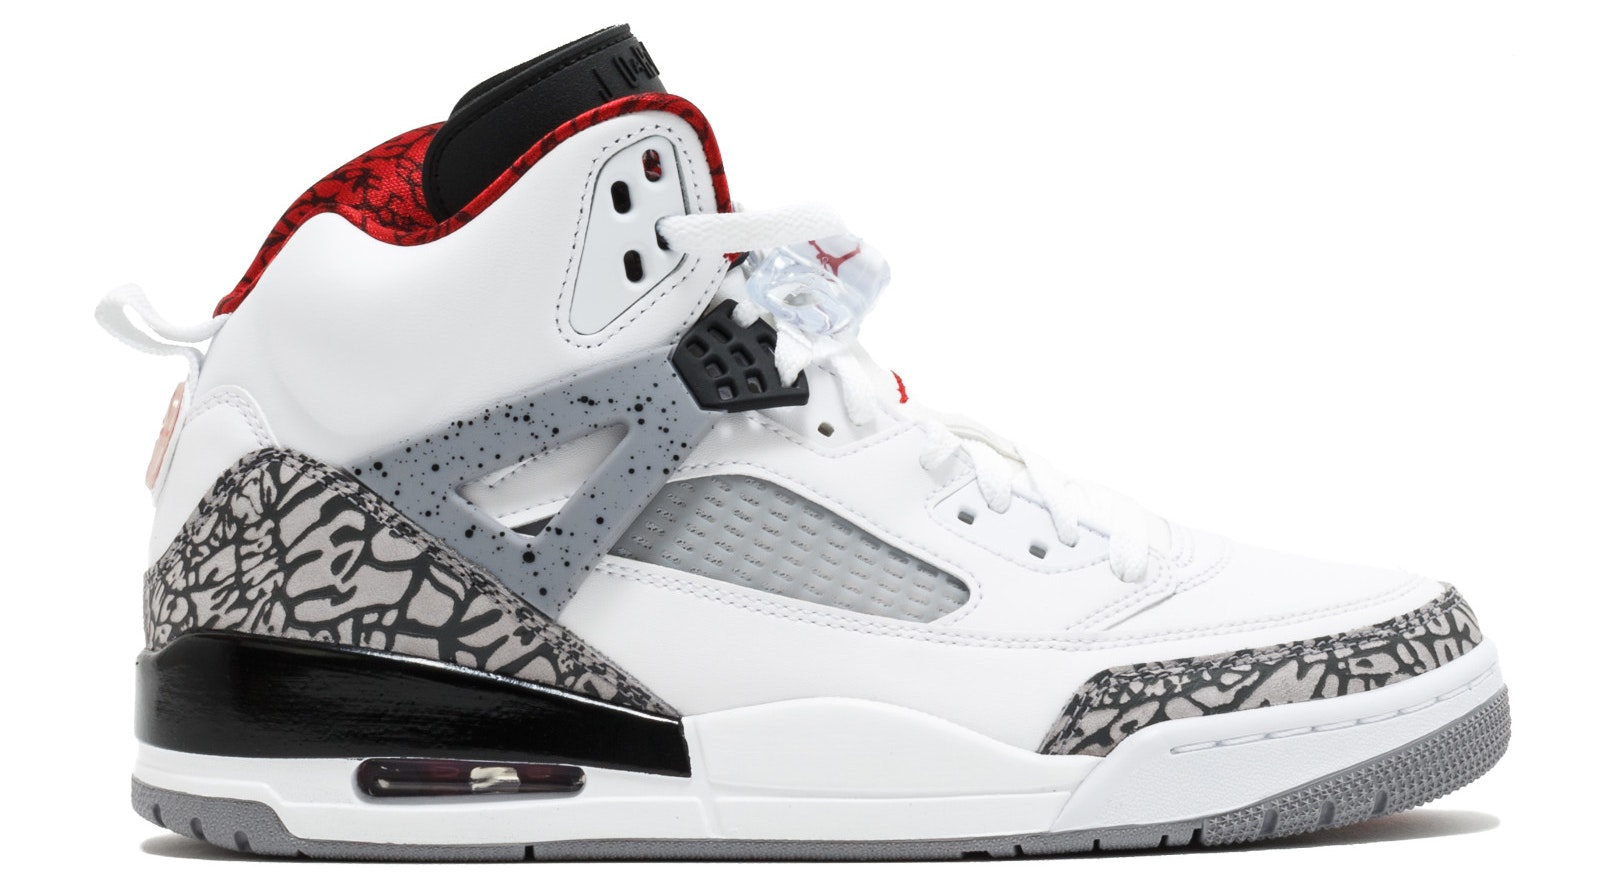 52ae5ee3ed4b Jordan White Cement Release Year